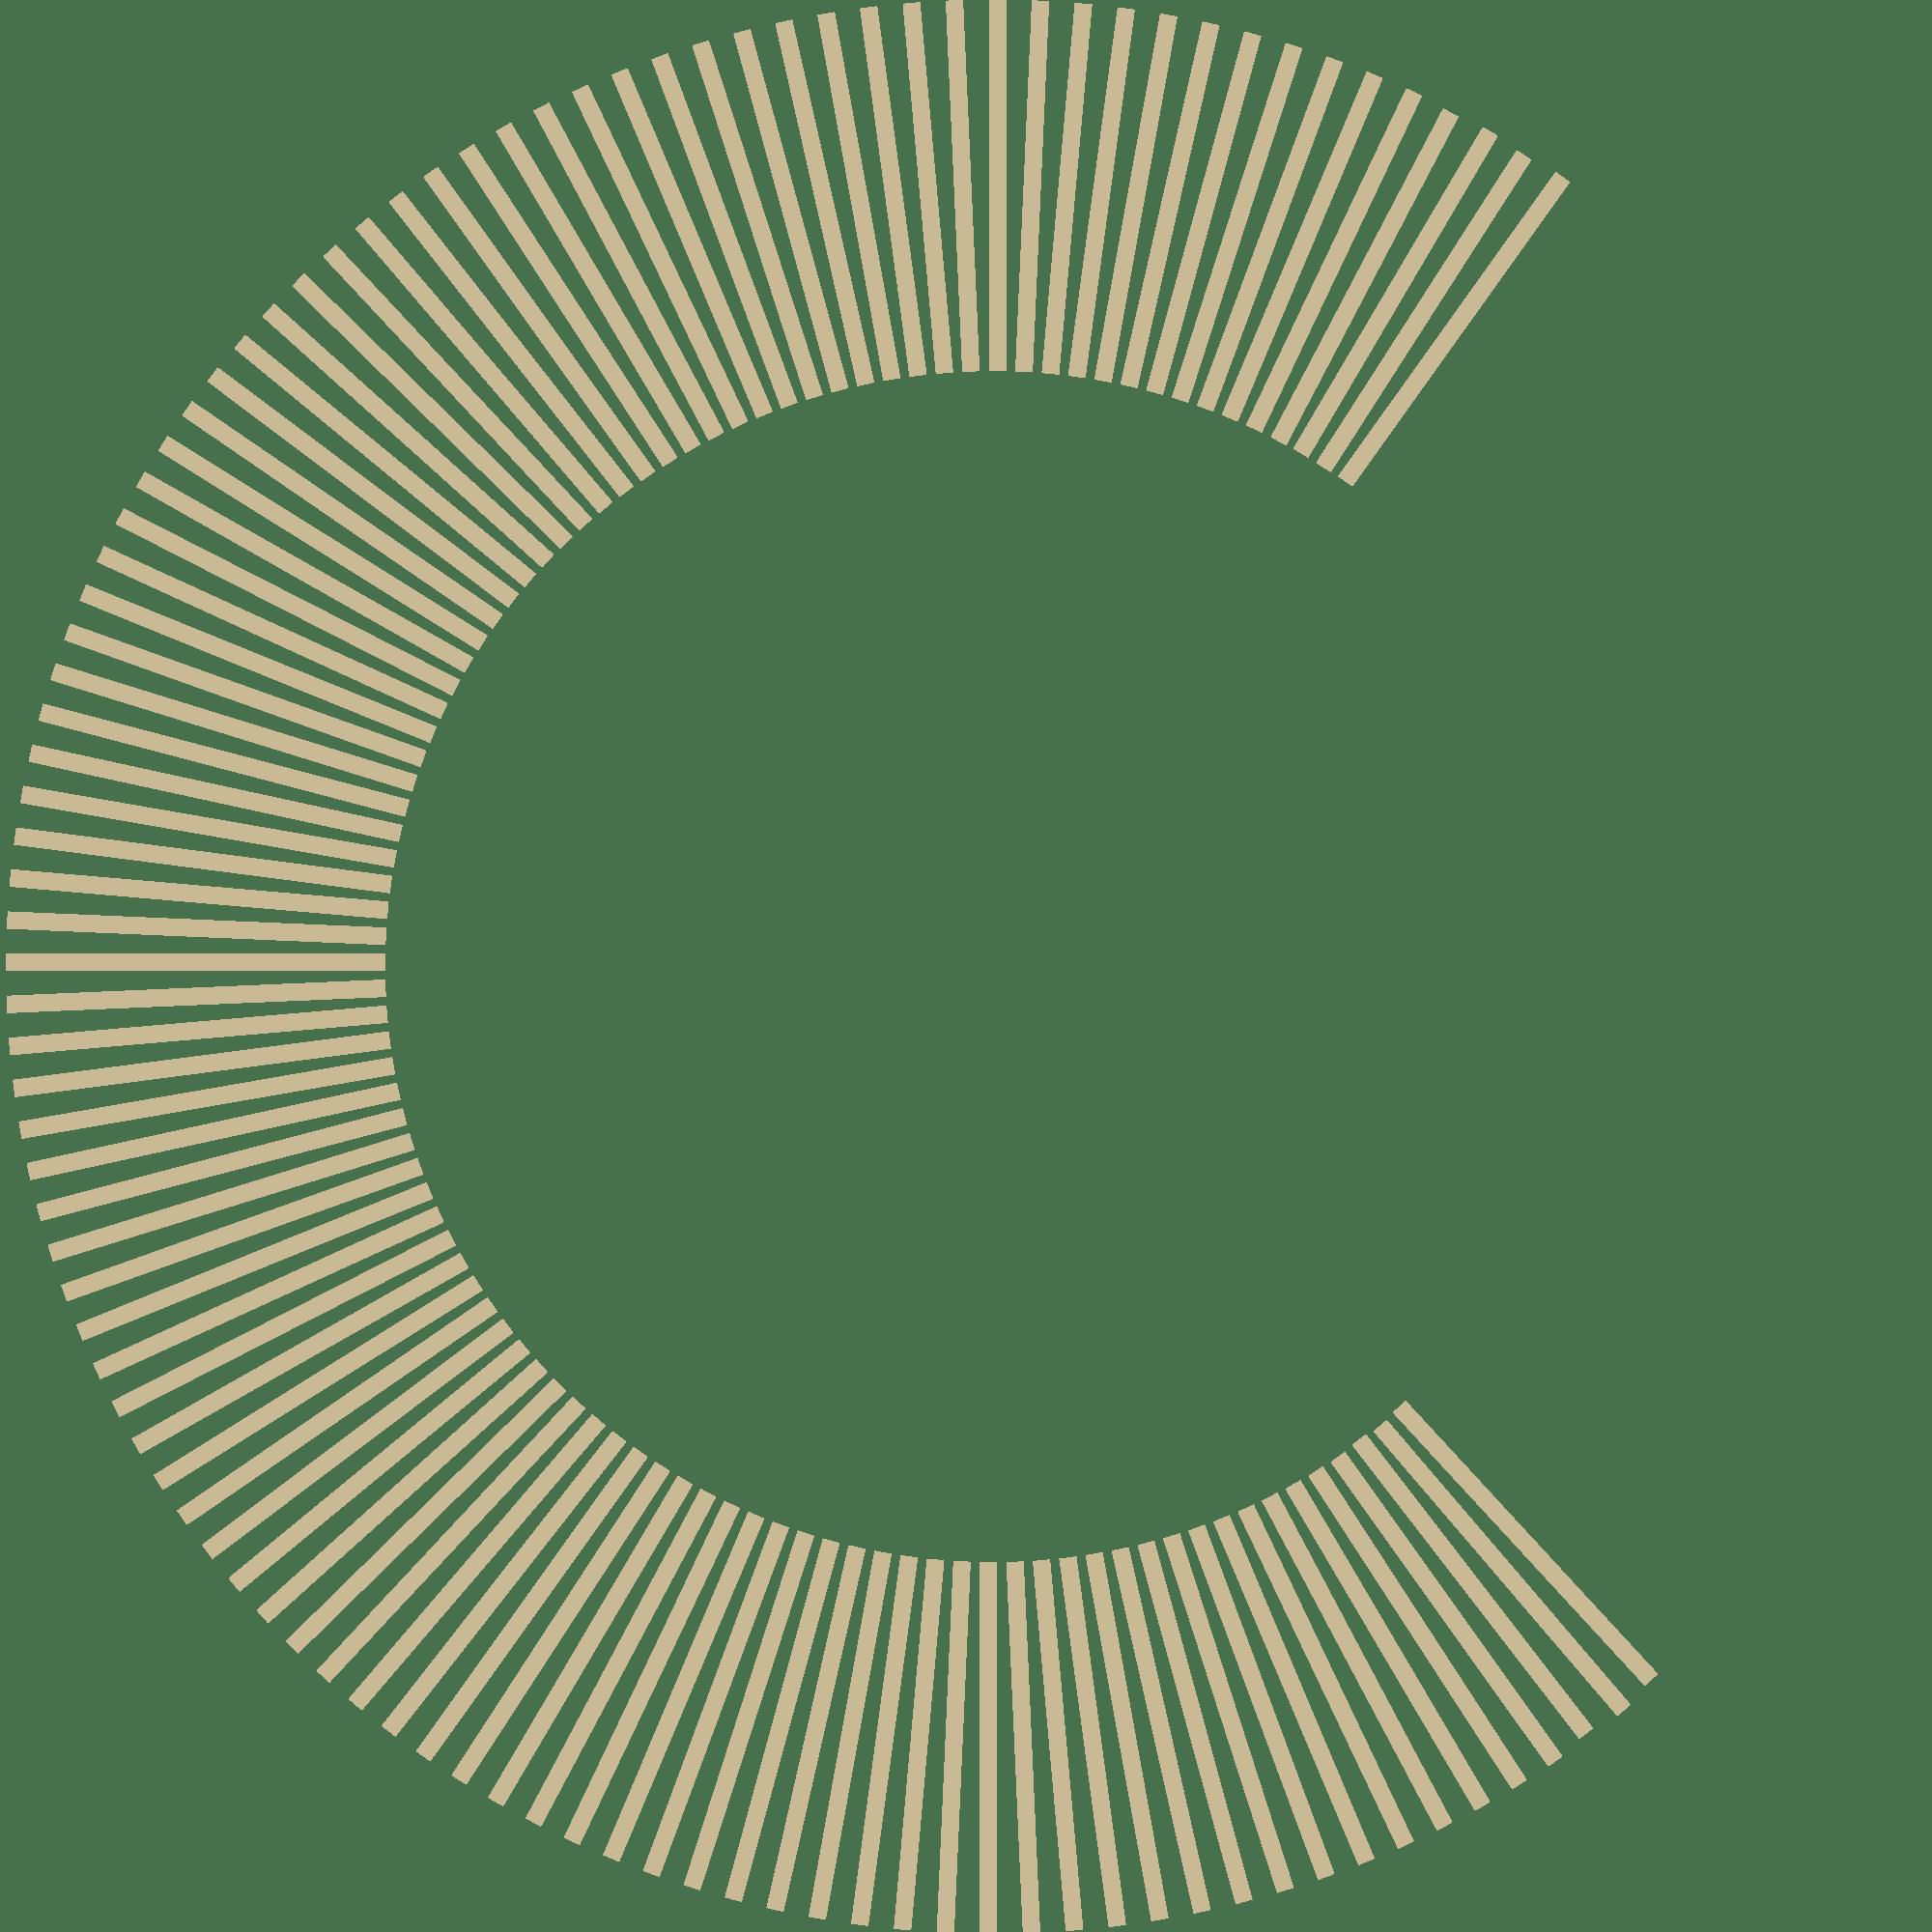 cevalon logo